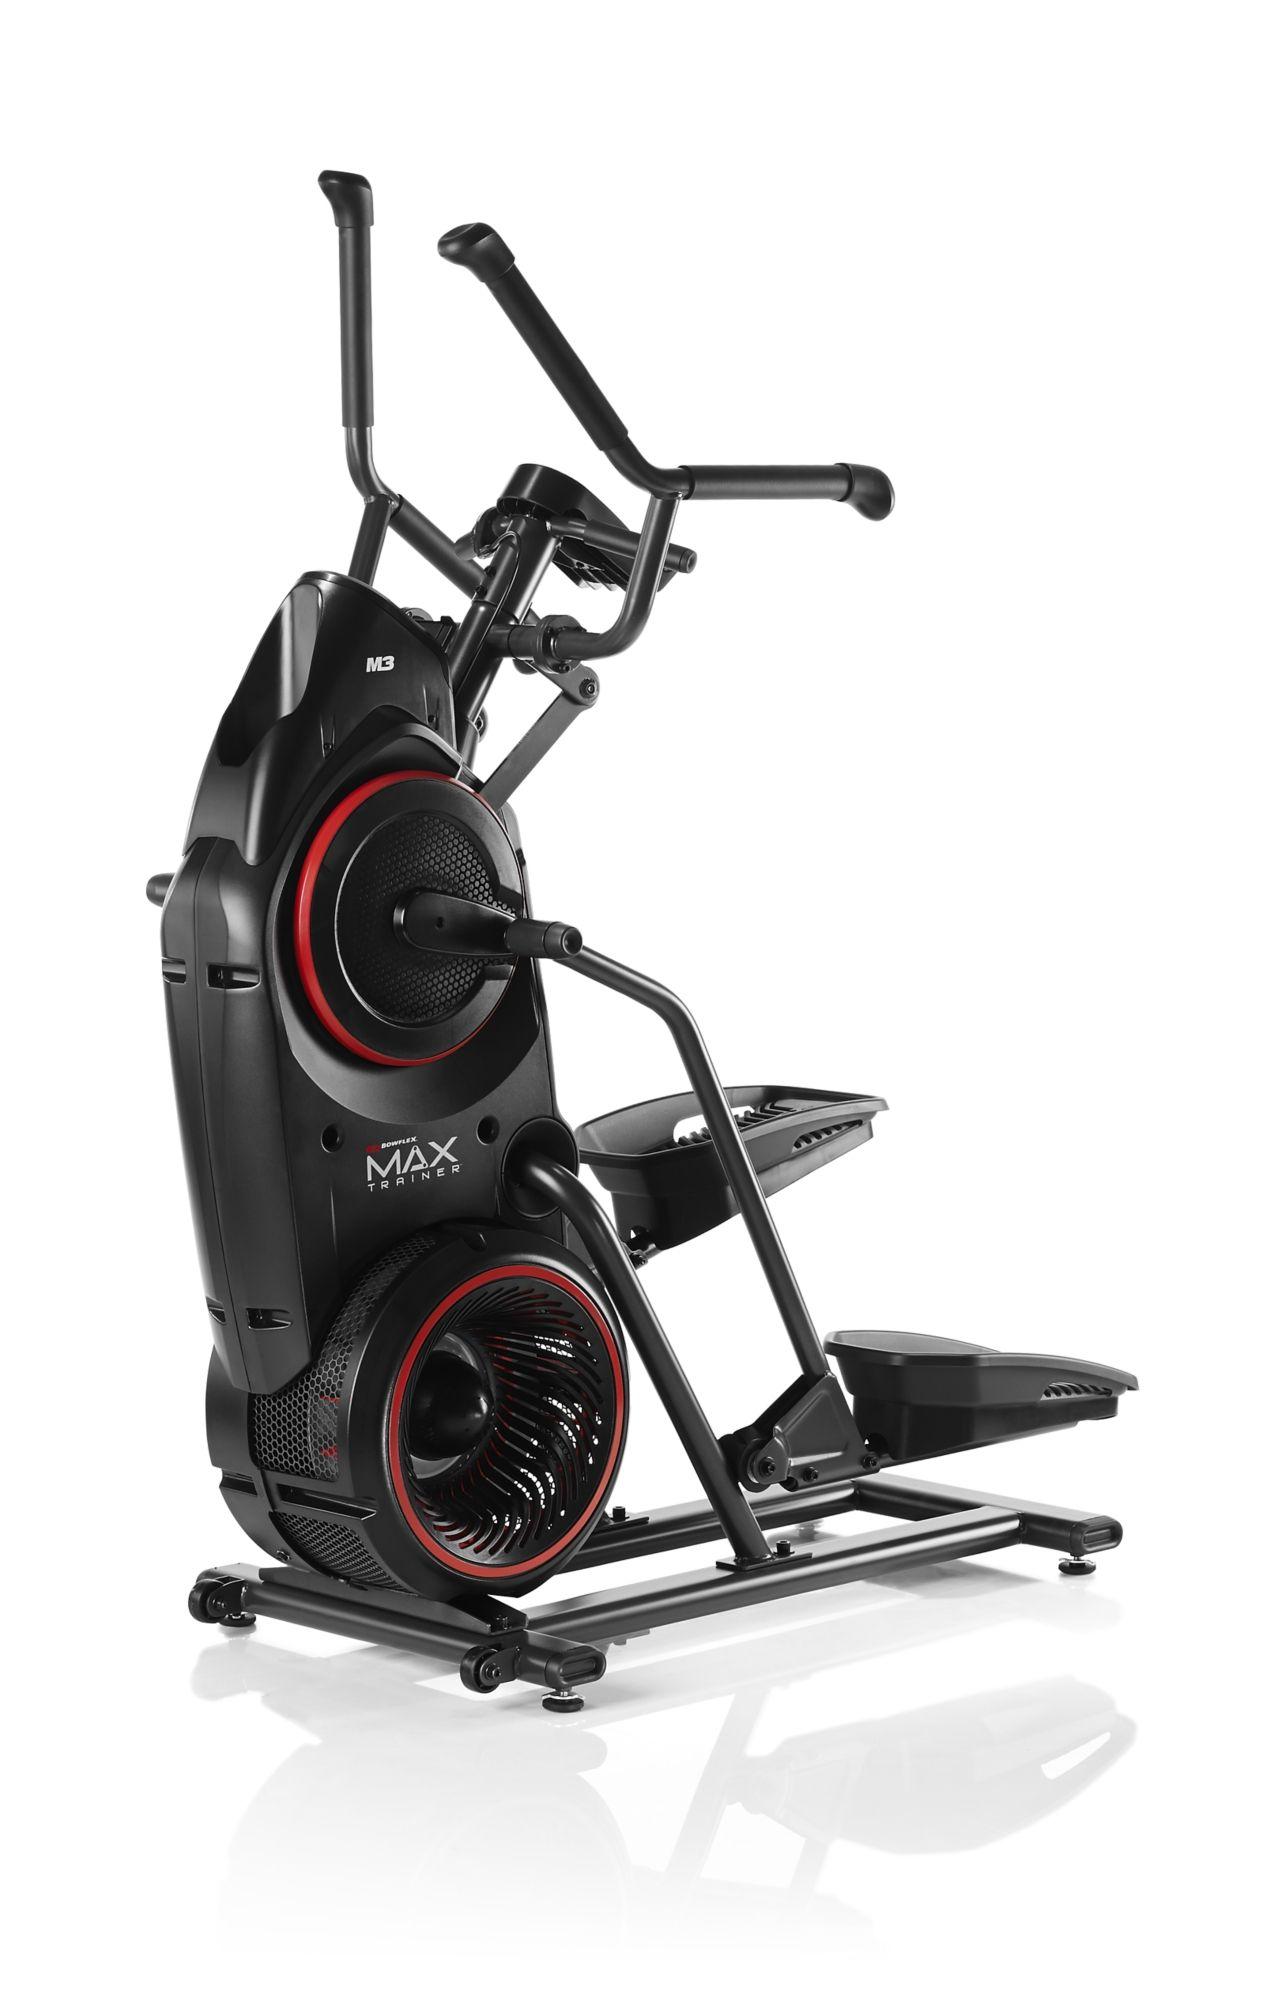 19 Inspirational Bowflex Max Trainer Workout Plan